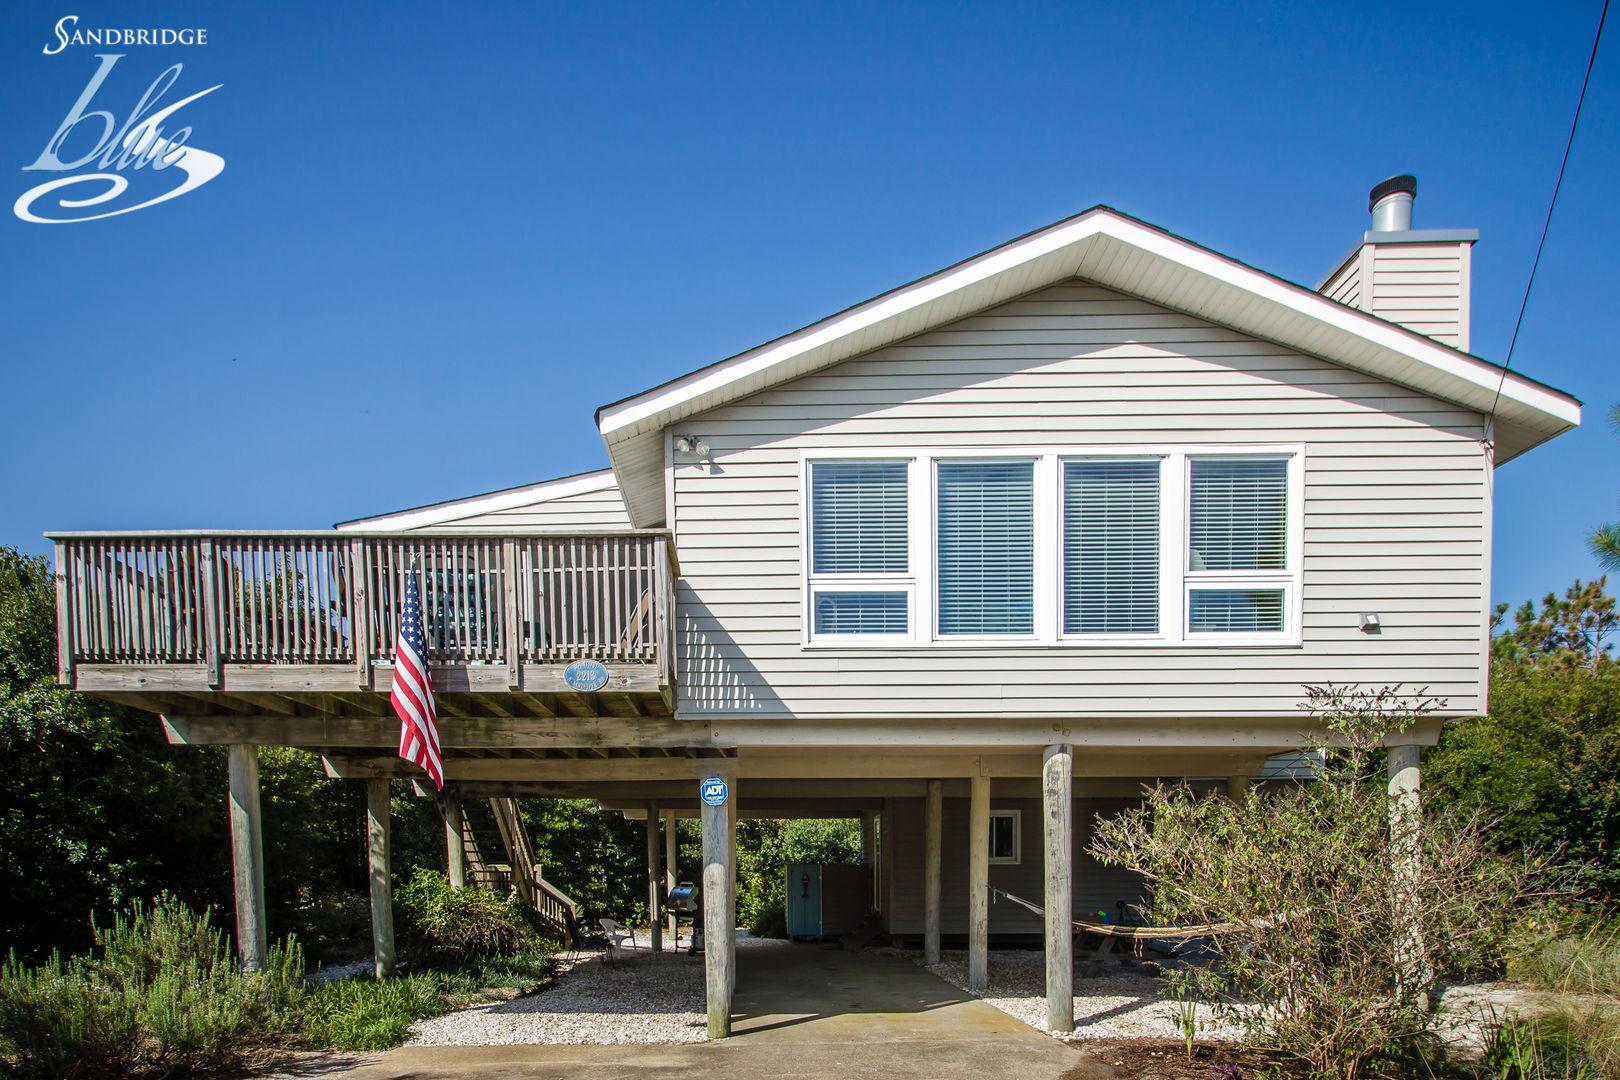 Bountiful - Virginia Beach Vacation Rentals - Sandbridge